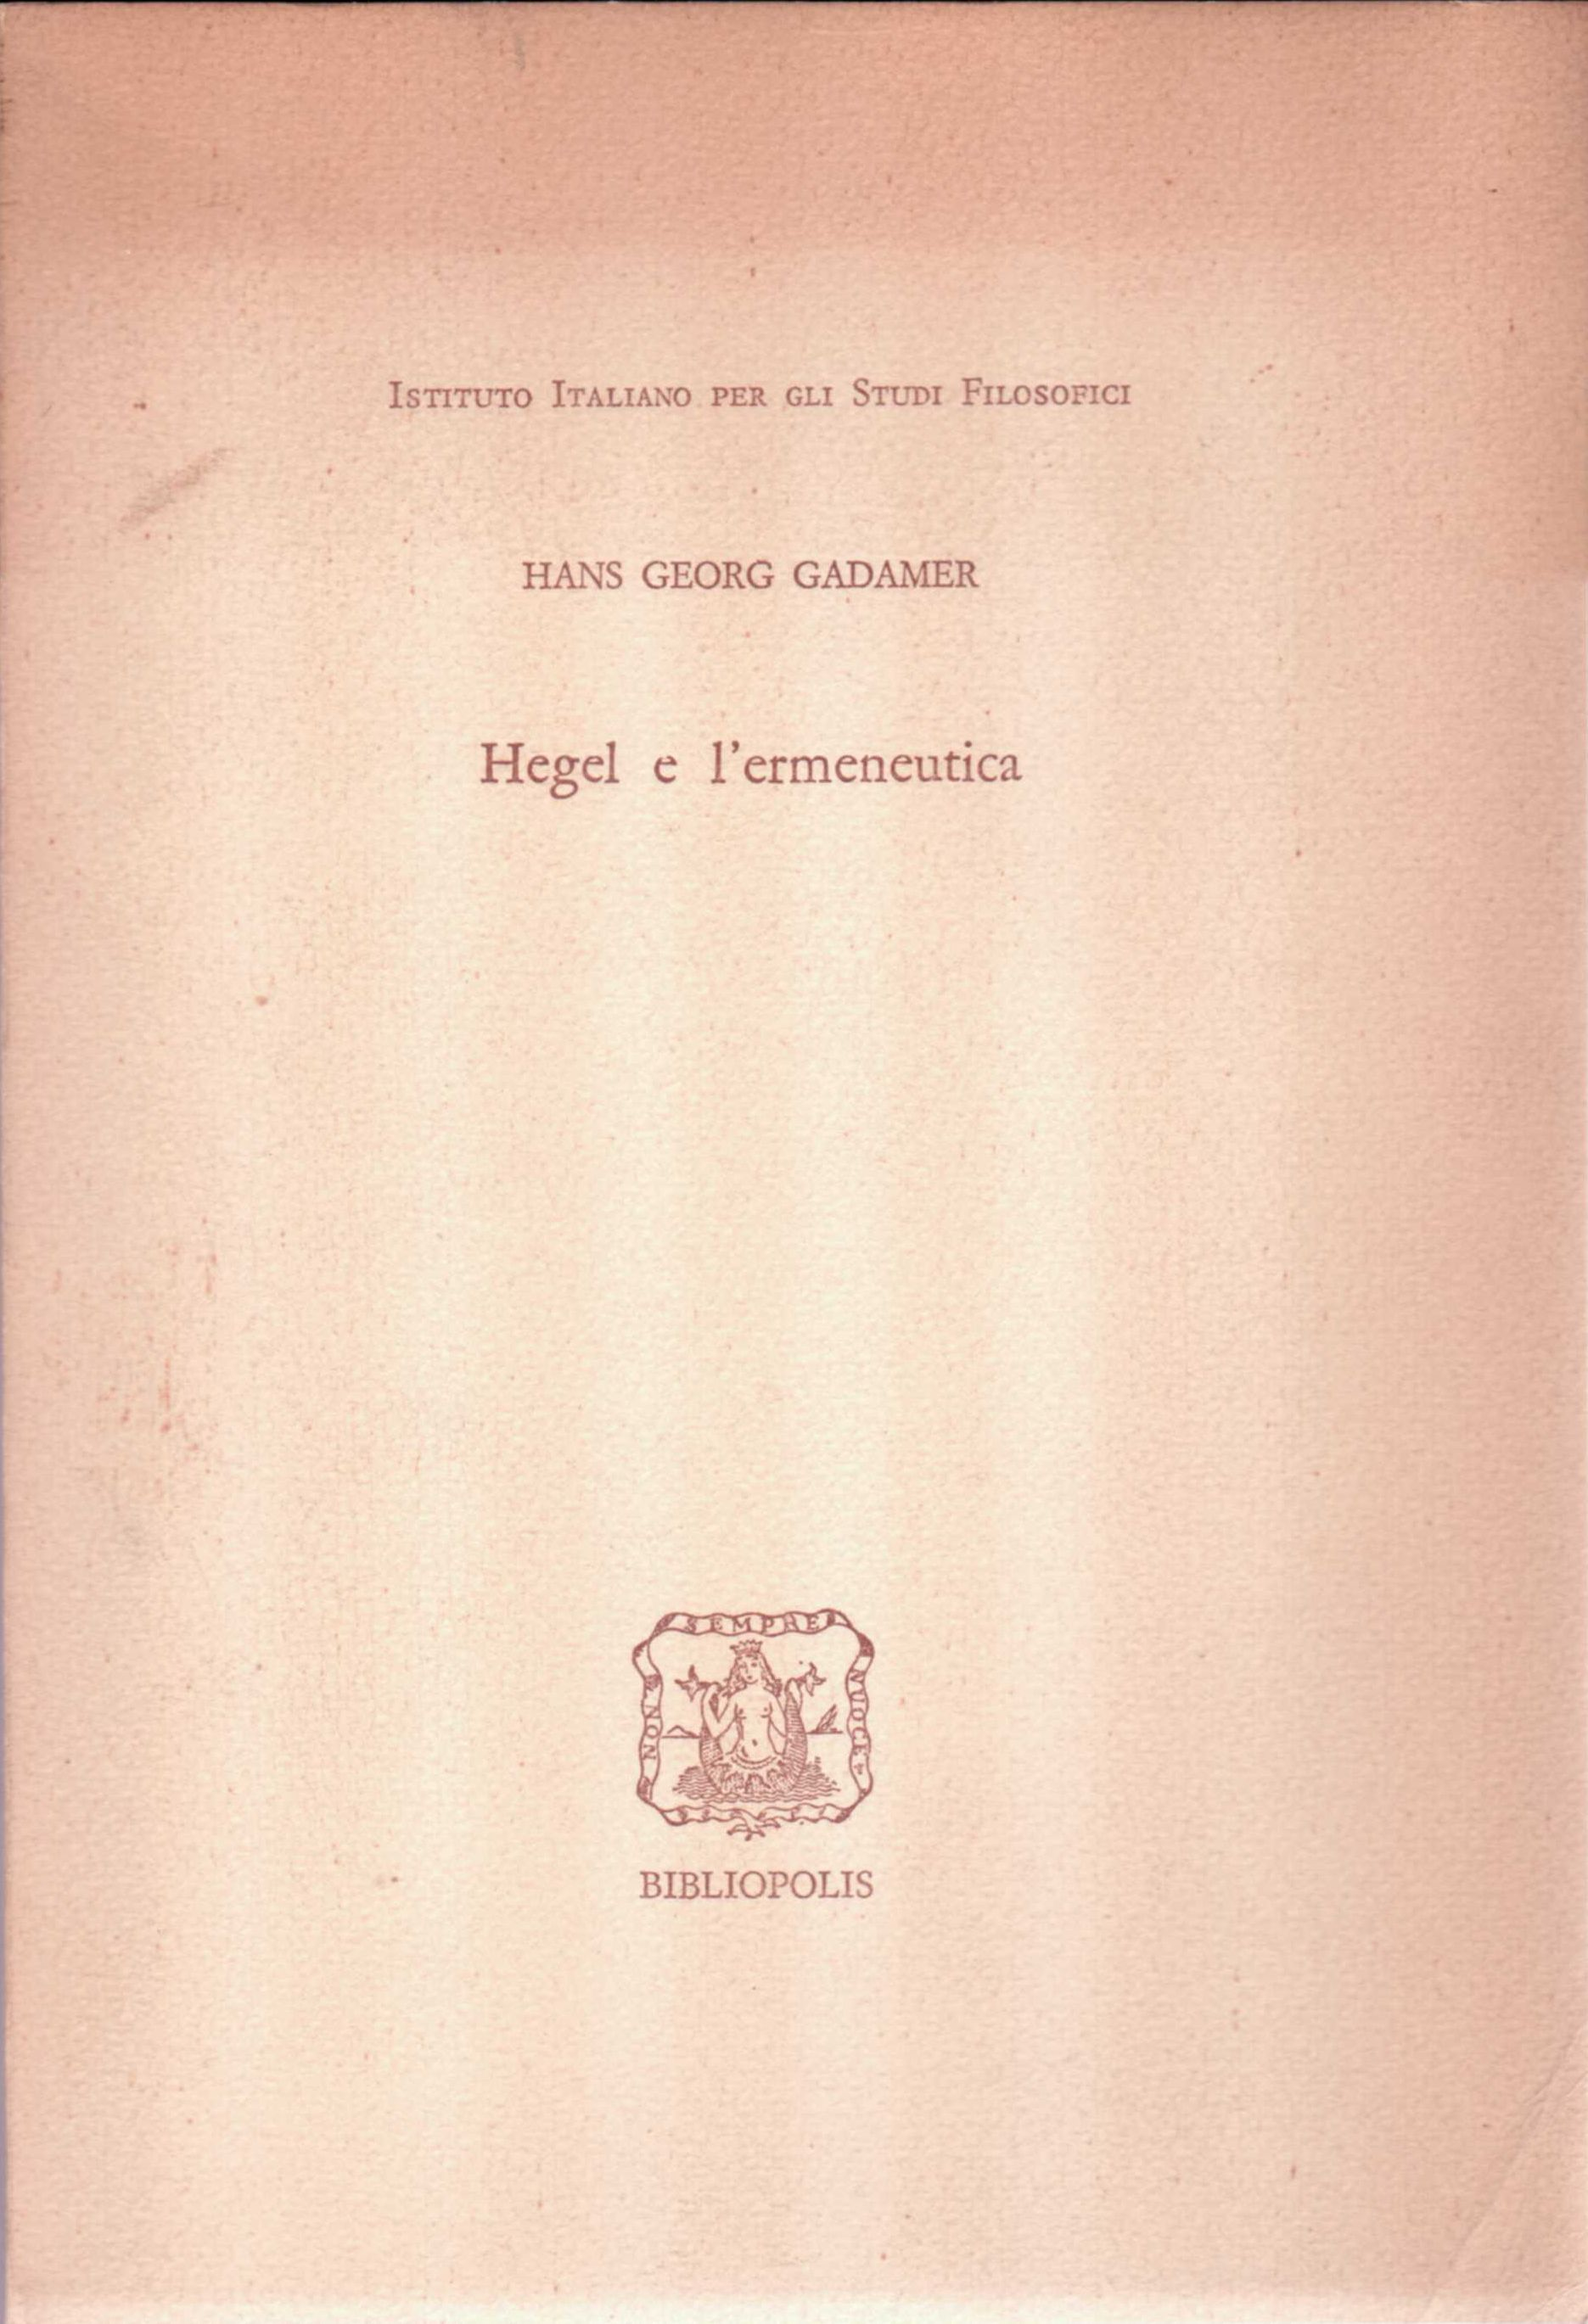 Hegel e l'ermeneutica